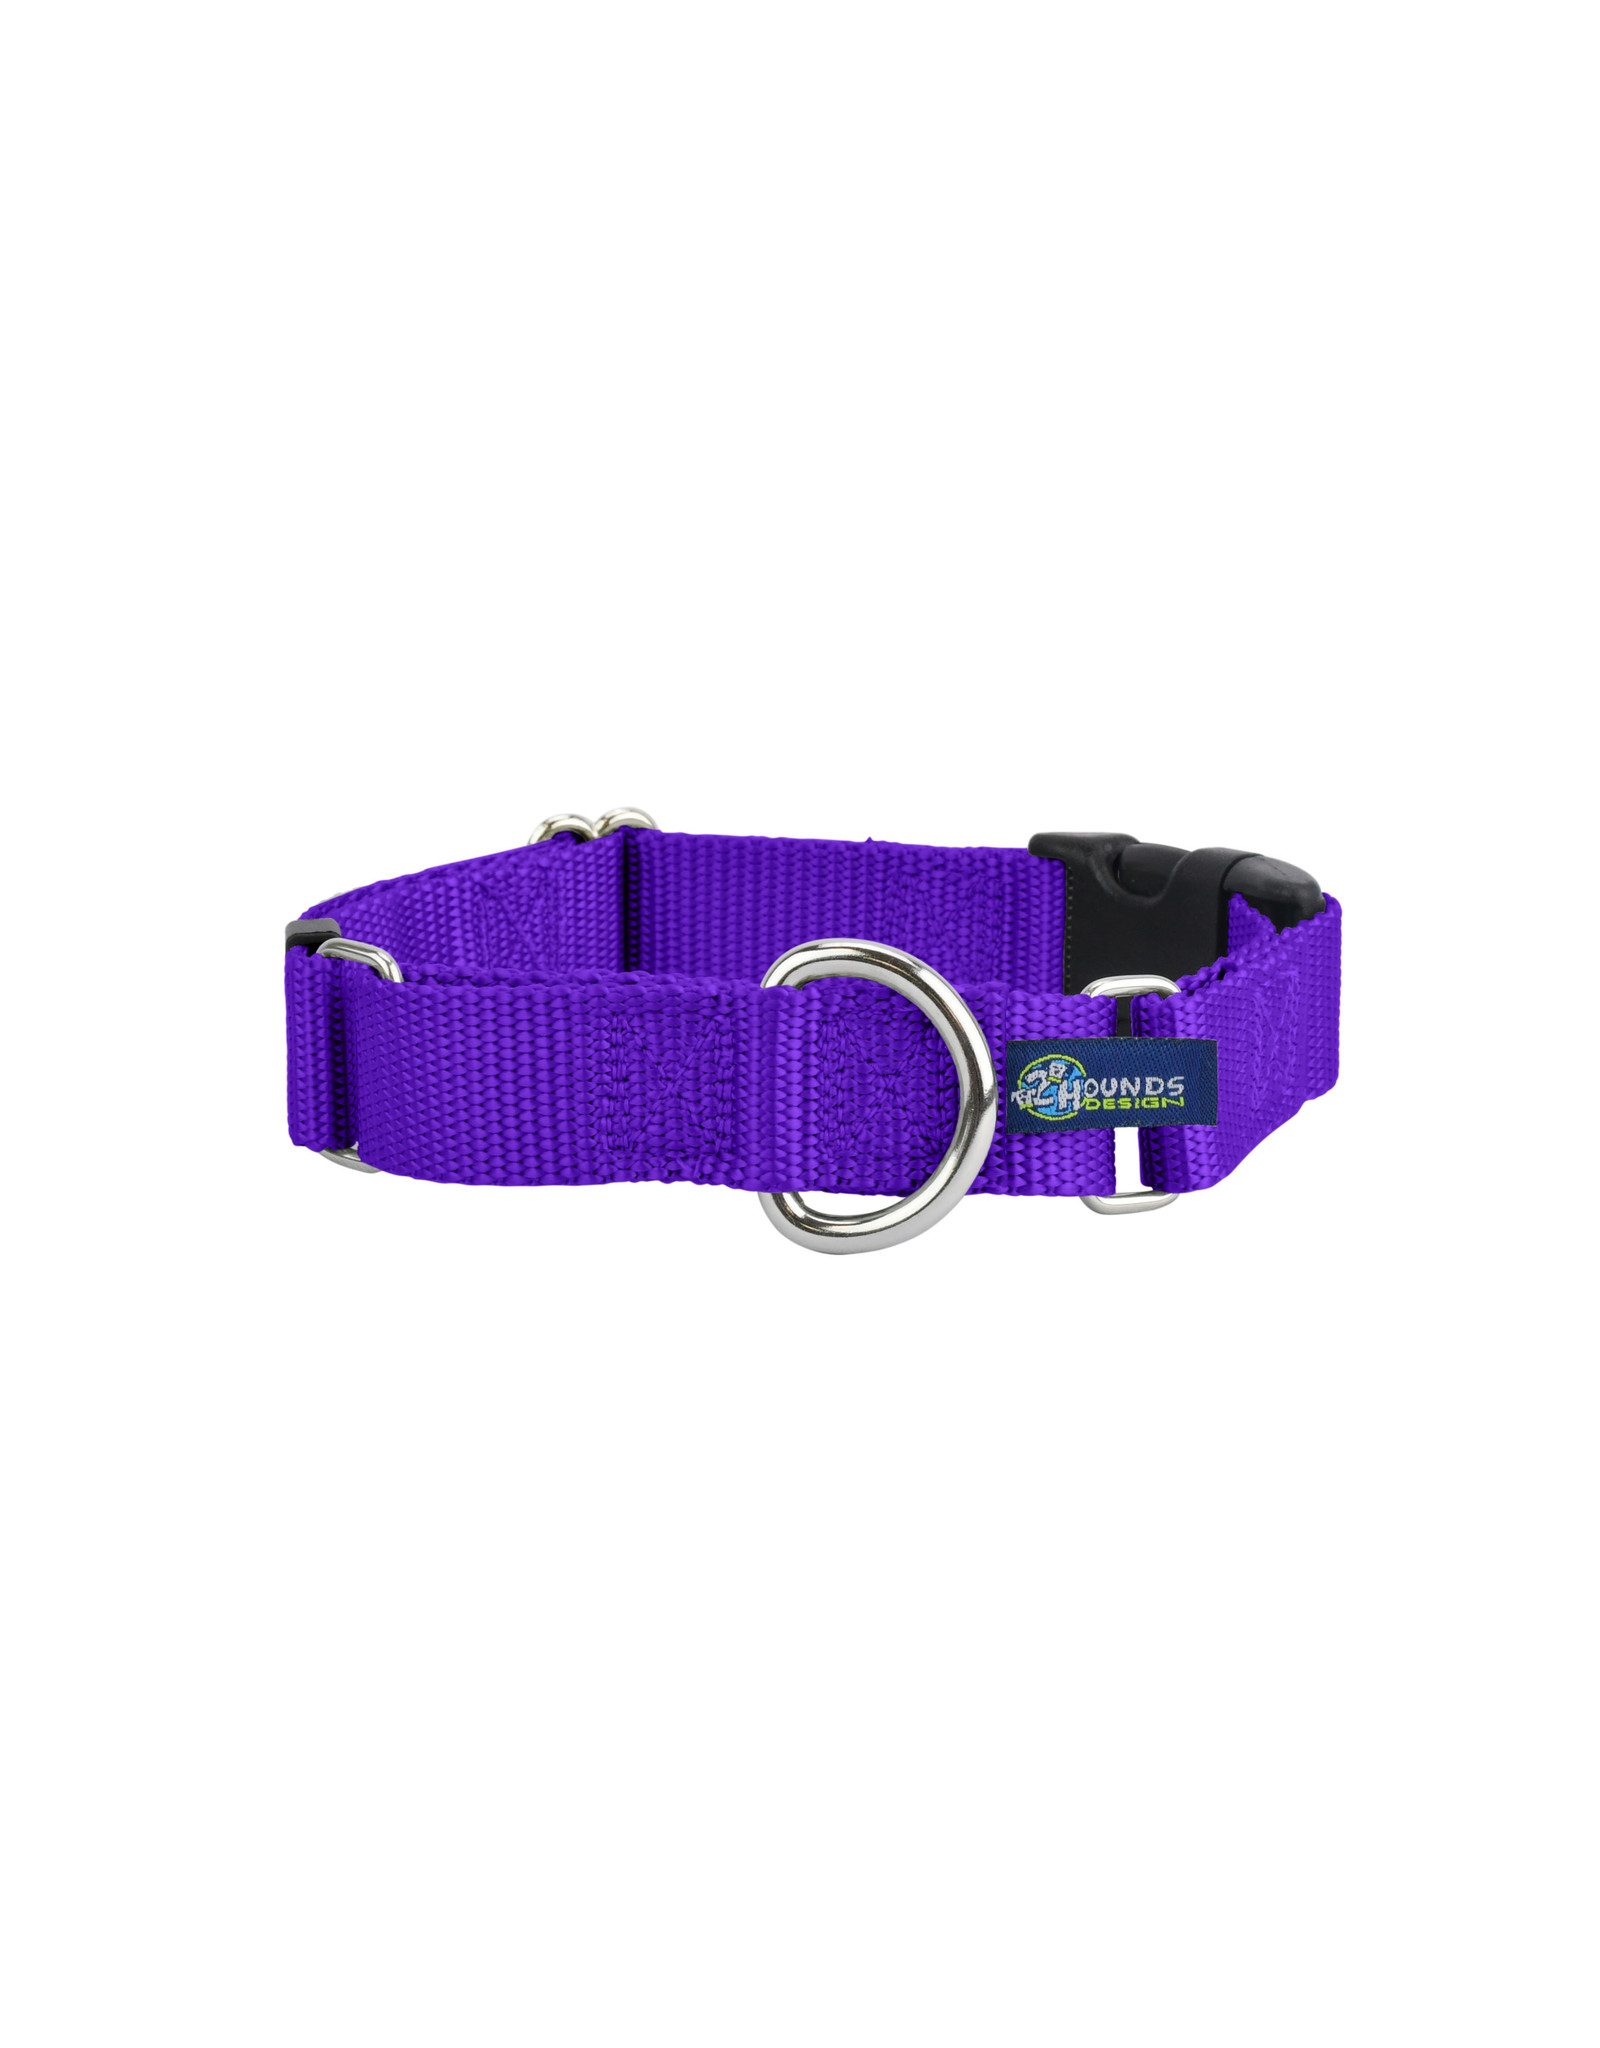 "2 Hounds Design Martingale w/ buckle: Purple, 1"" XL"